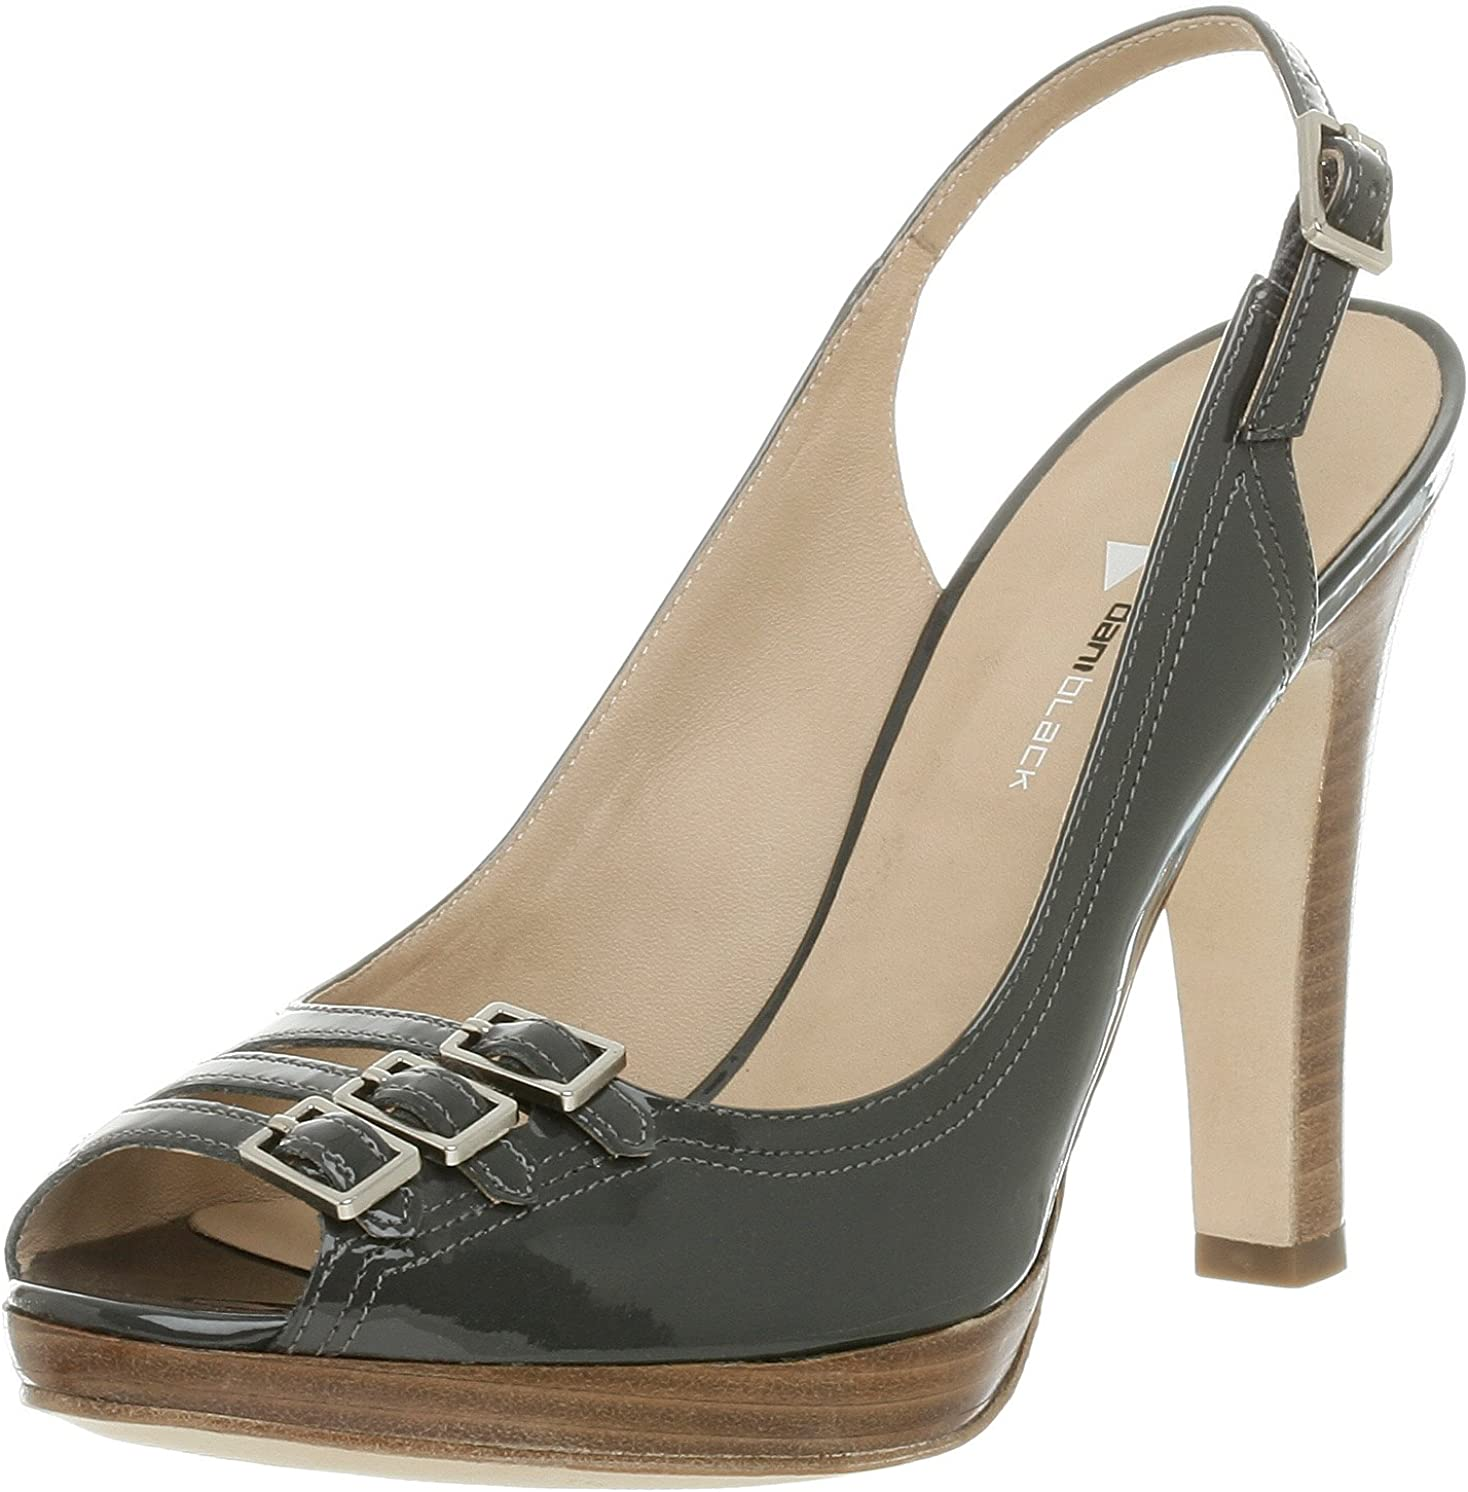 Regular store daniblack Women's Max 89% OFF Wander Toe Peep Slingback